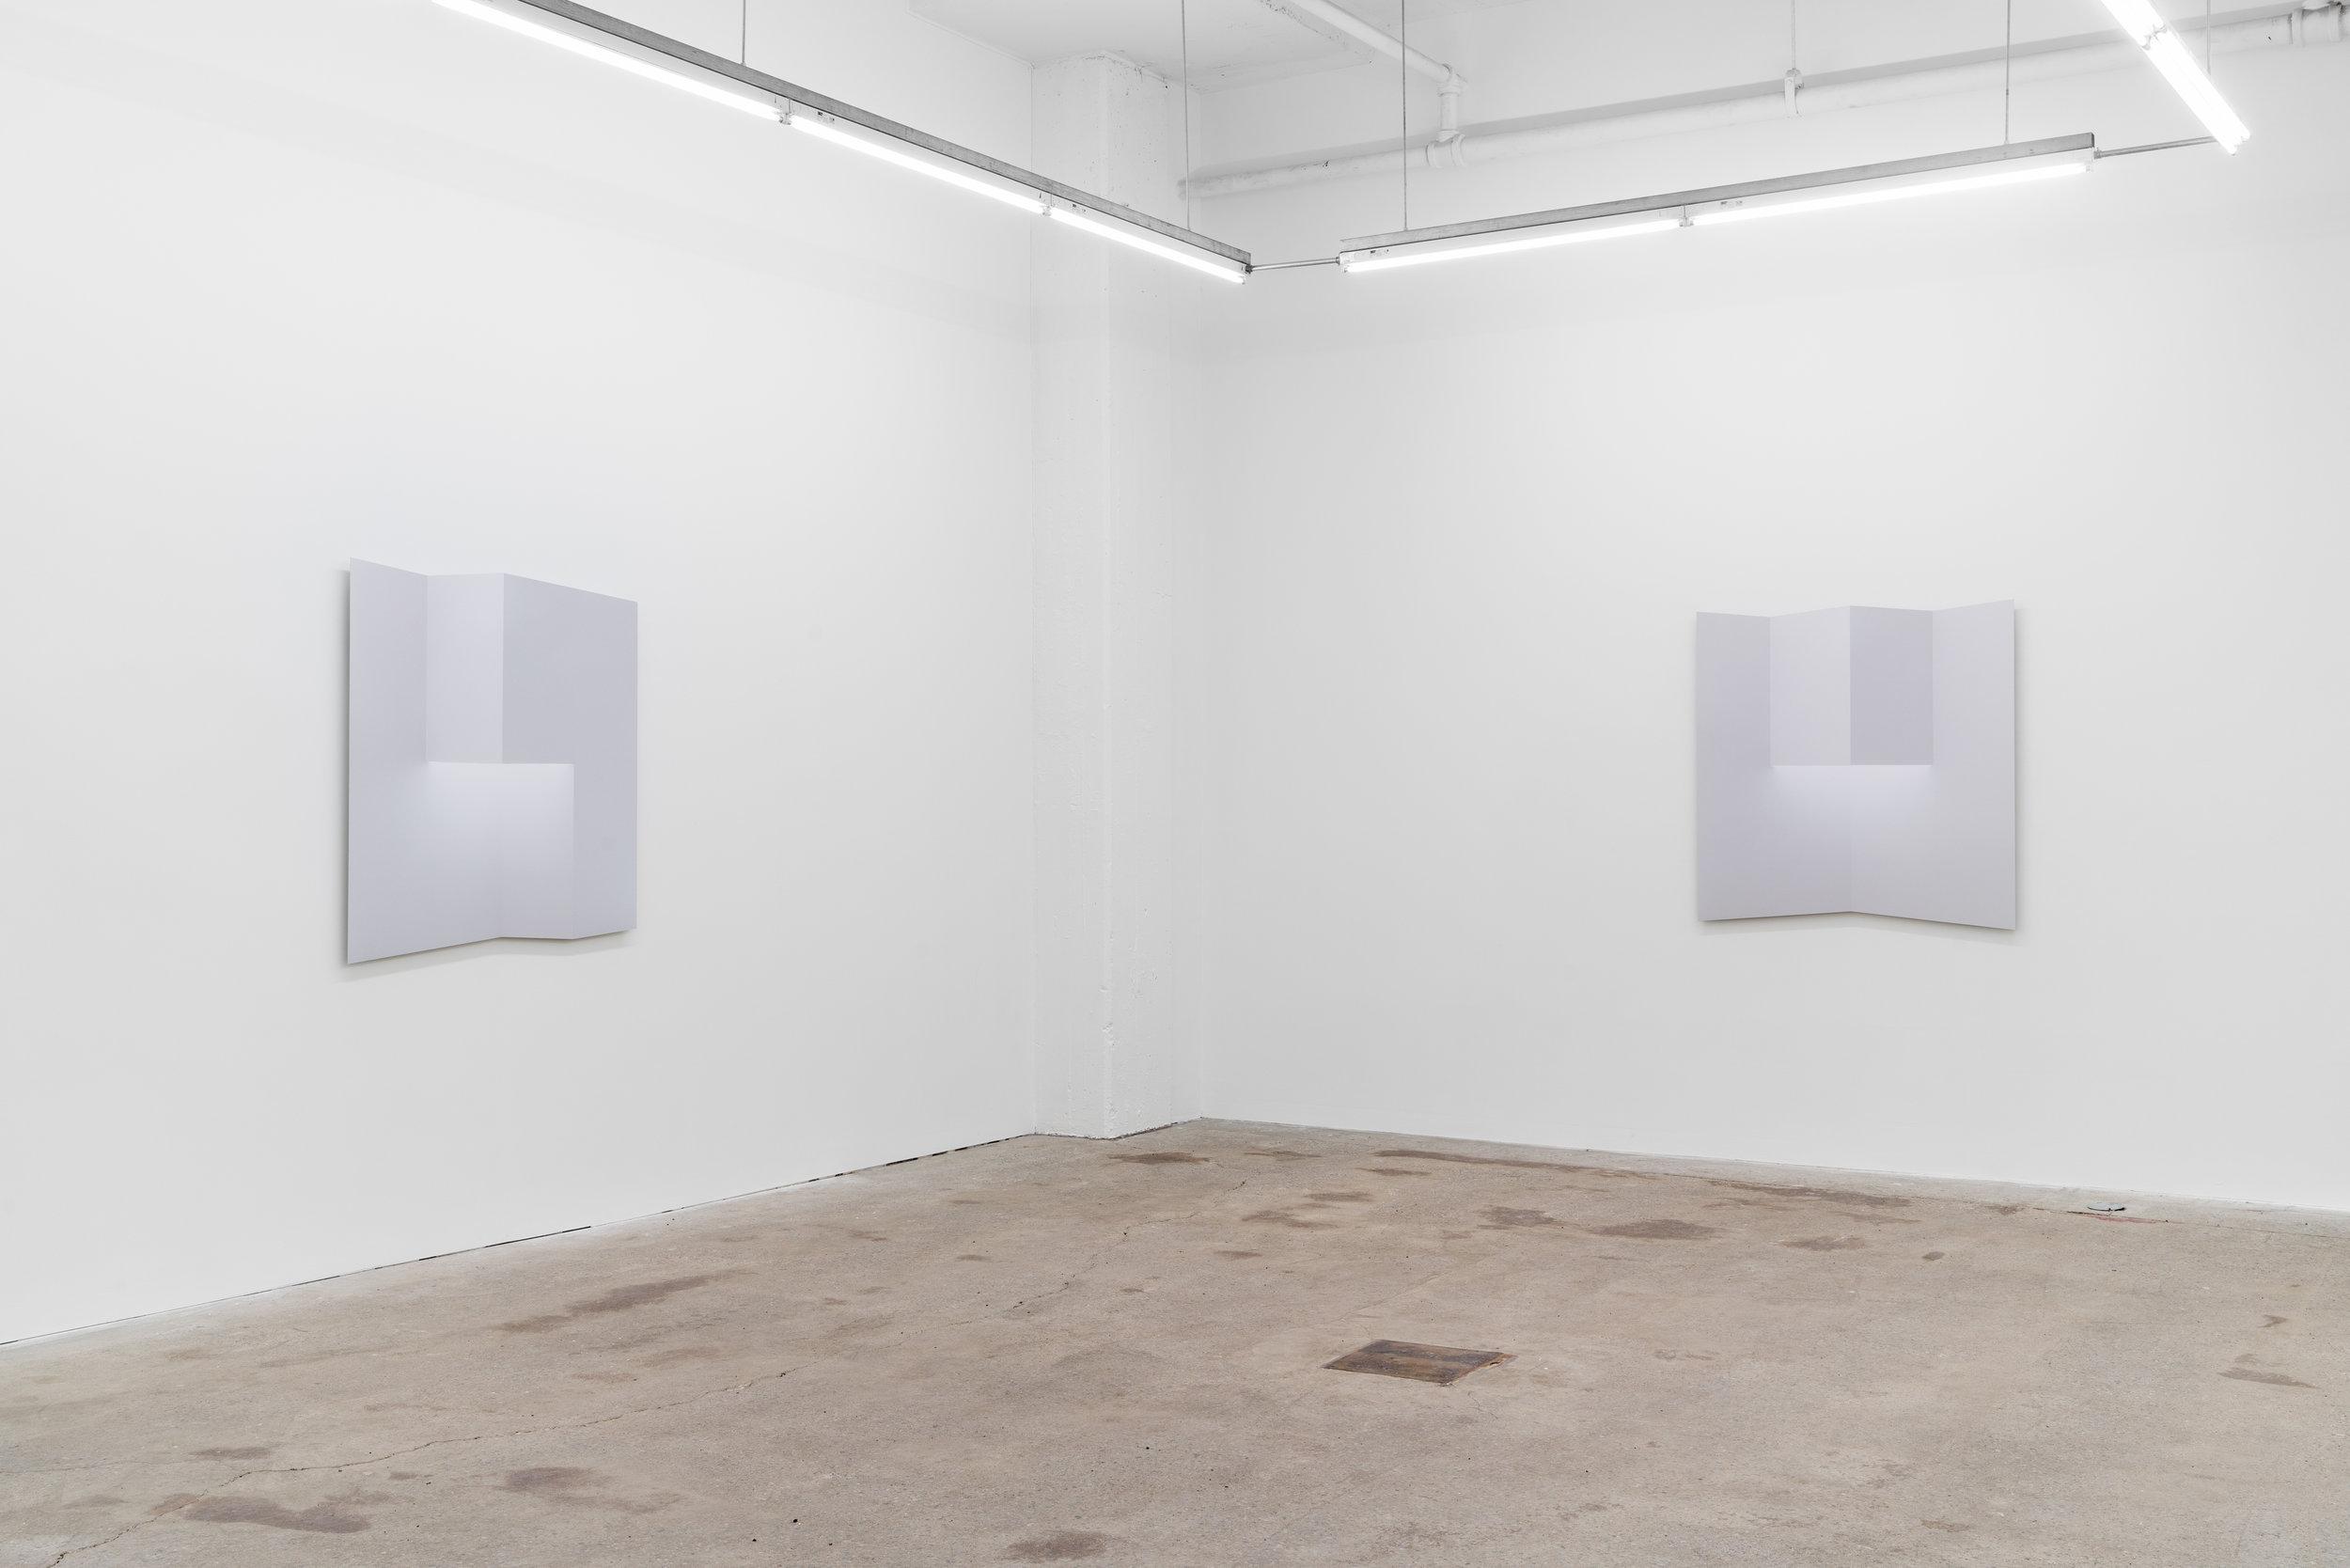 Caroline Cloutier,  Pliages , 2018, vue d'exposition, Galerie Nicolas Robert, photo : Jean-Michael Seminaro